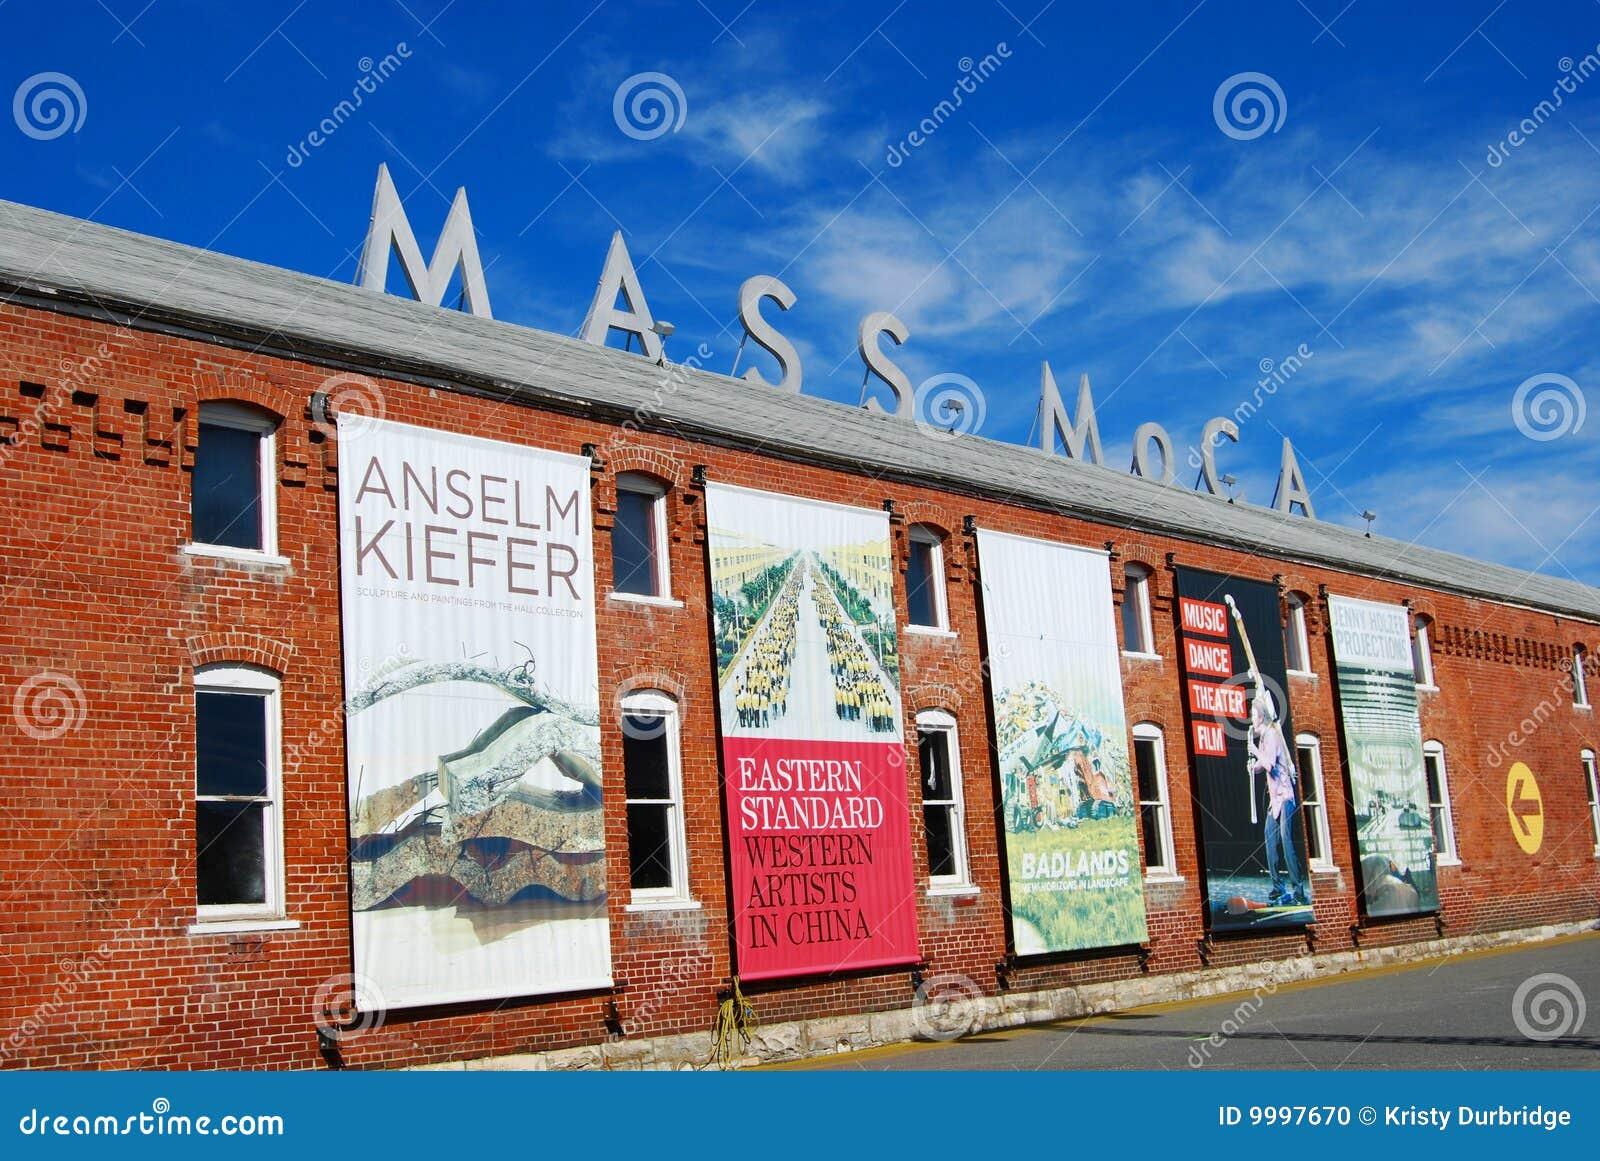 Masachustts Mueum Of Modern Art Moca